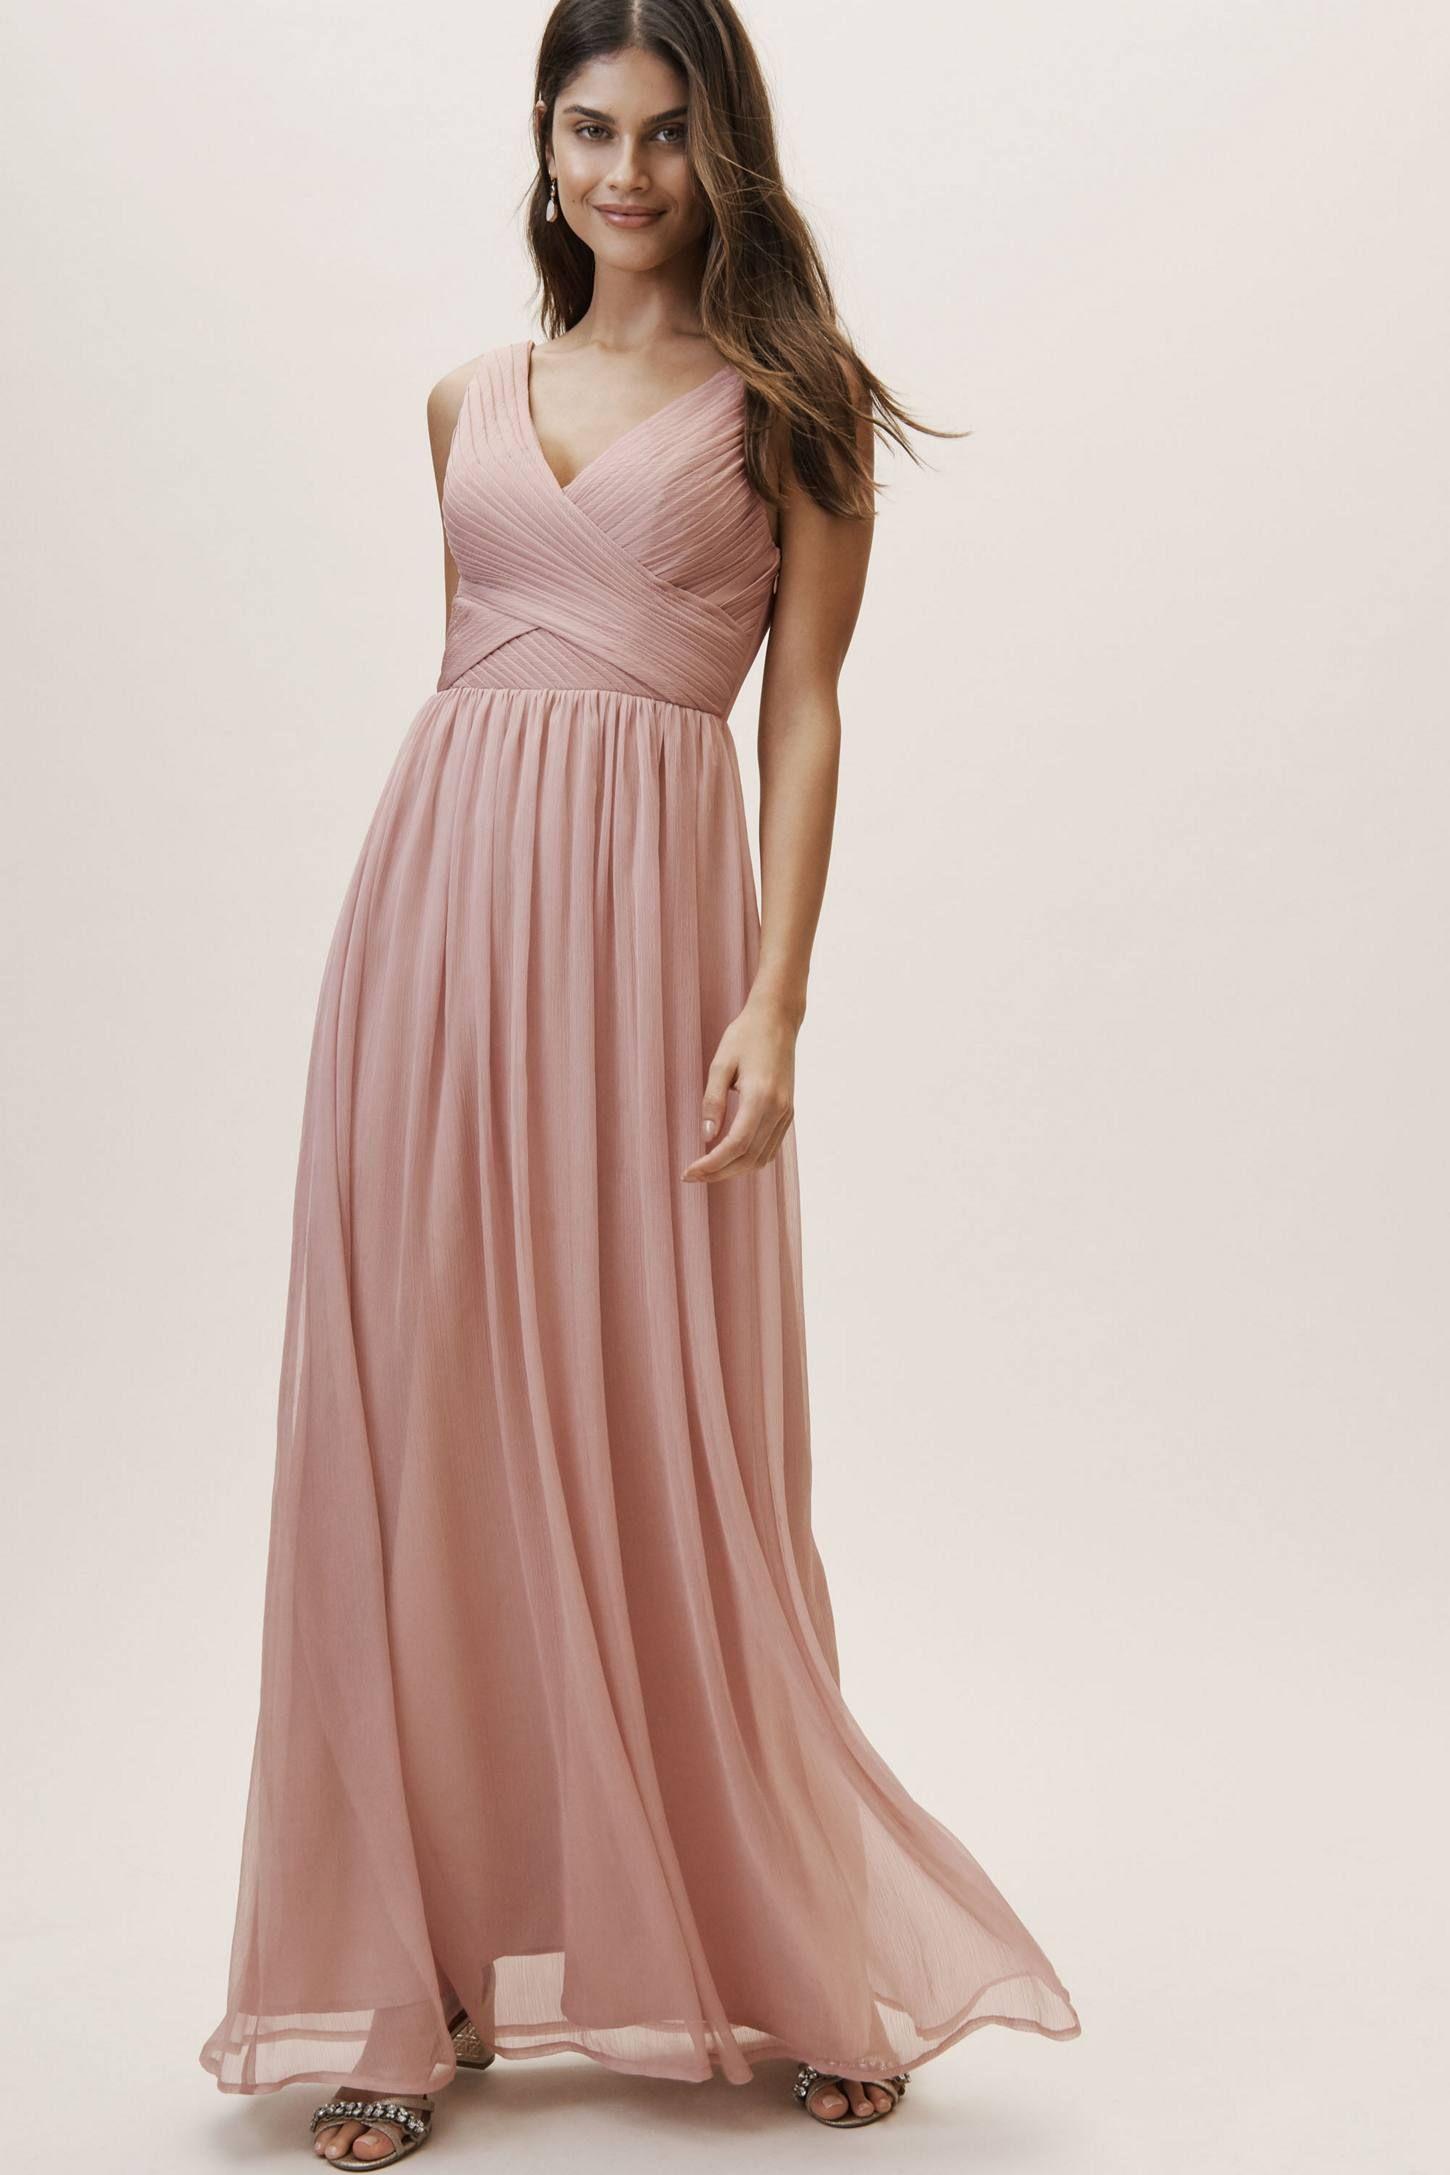 Kia Dress Dresses, Classic bridesmaids dresses, Wedding